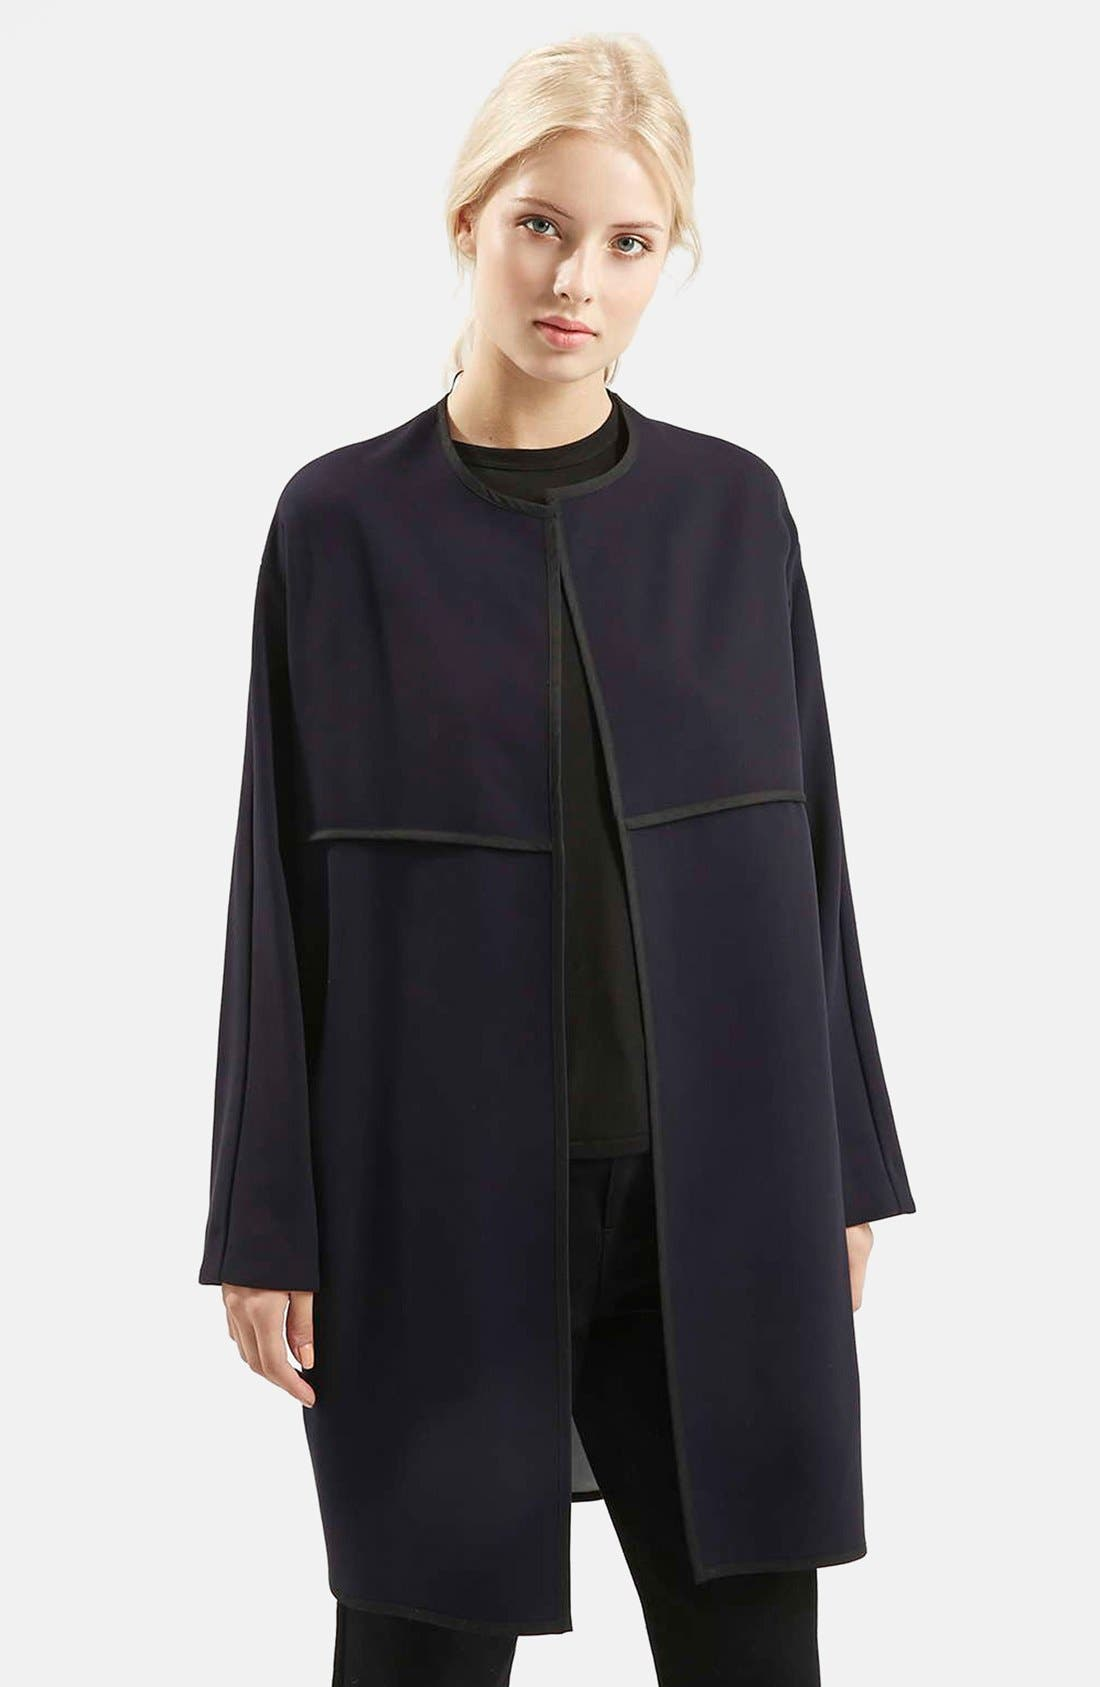 Alternate Image 1 Selected - Topshop 'Edge to Edge' Blanket Coat